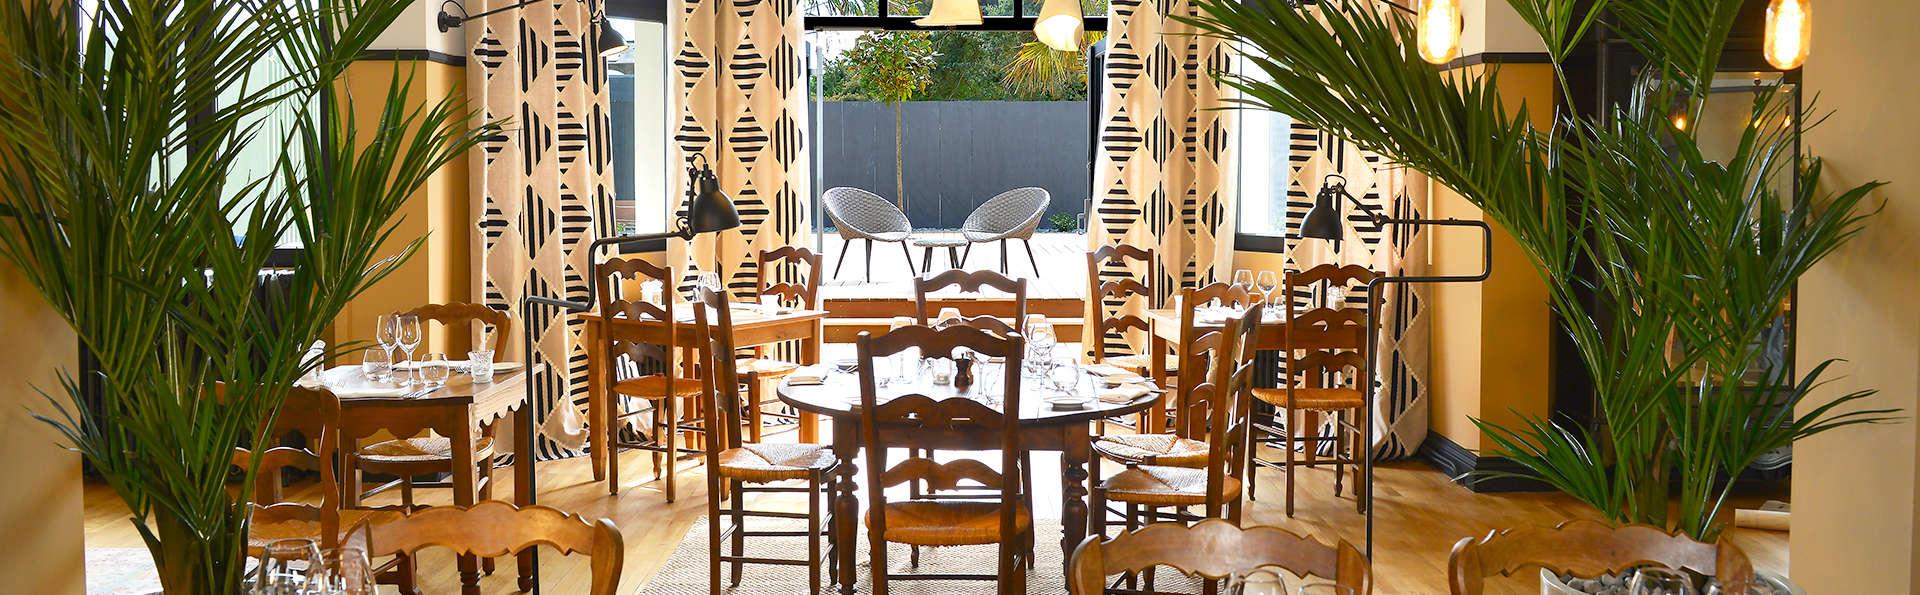 Week-end avec dîner près du Cap Fréhel